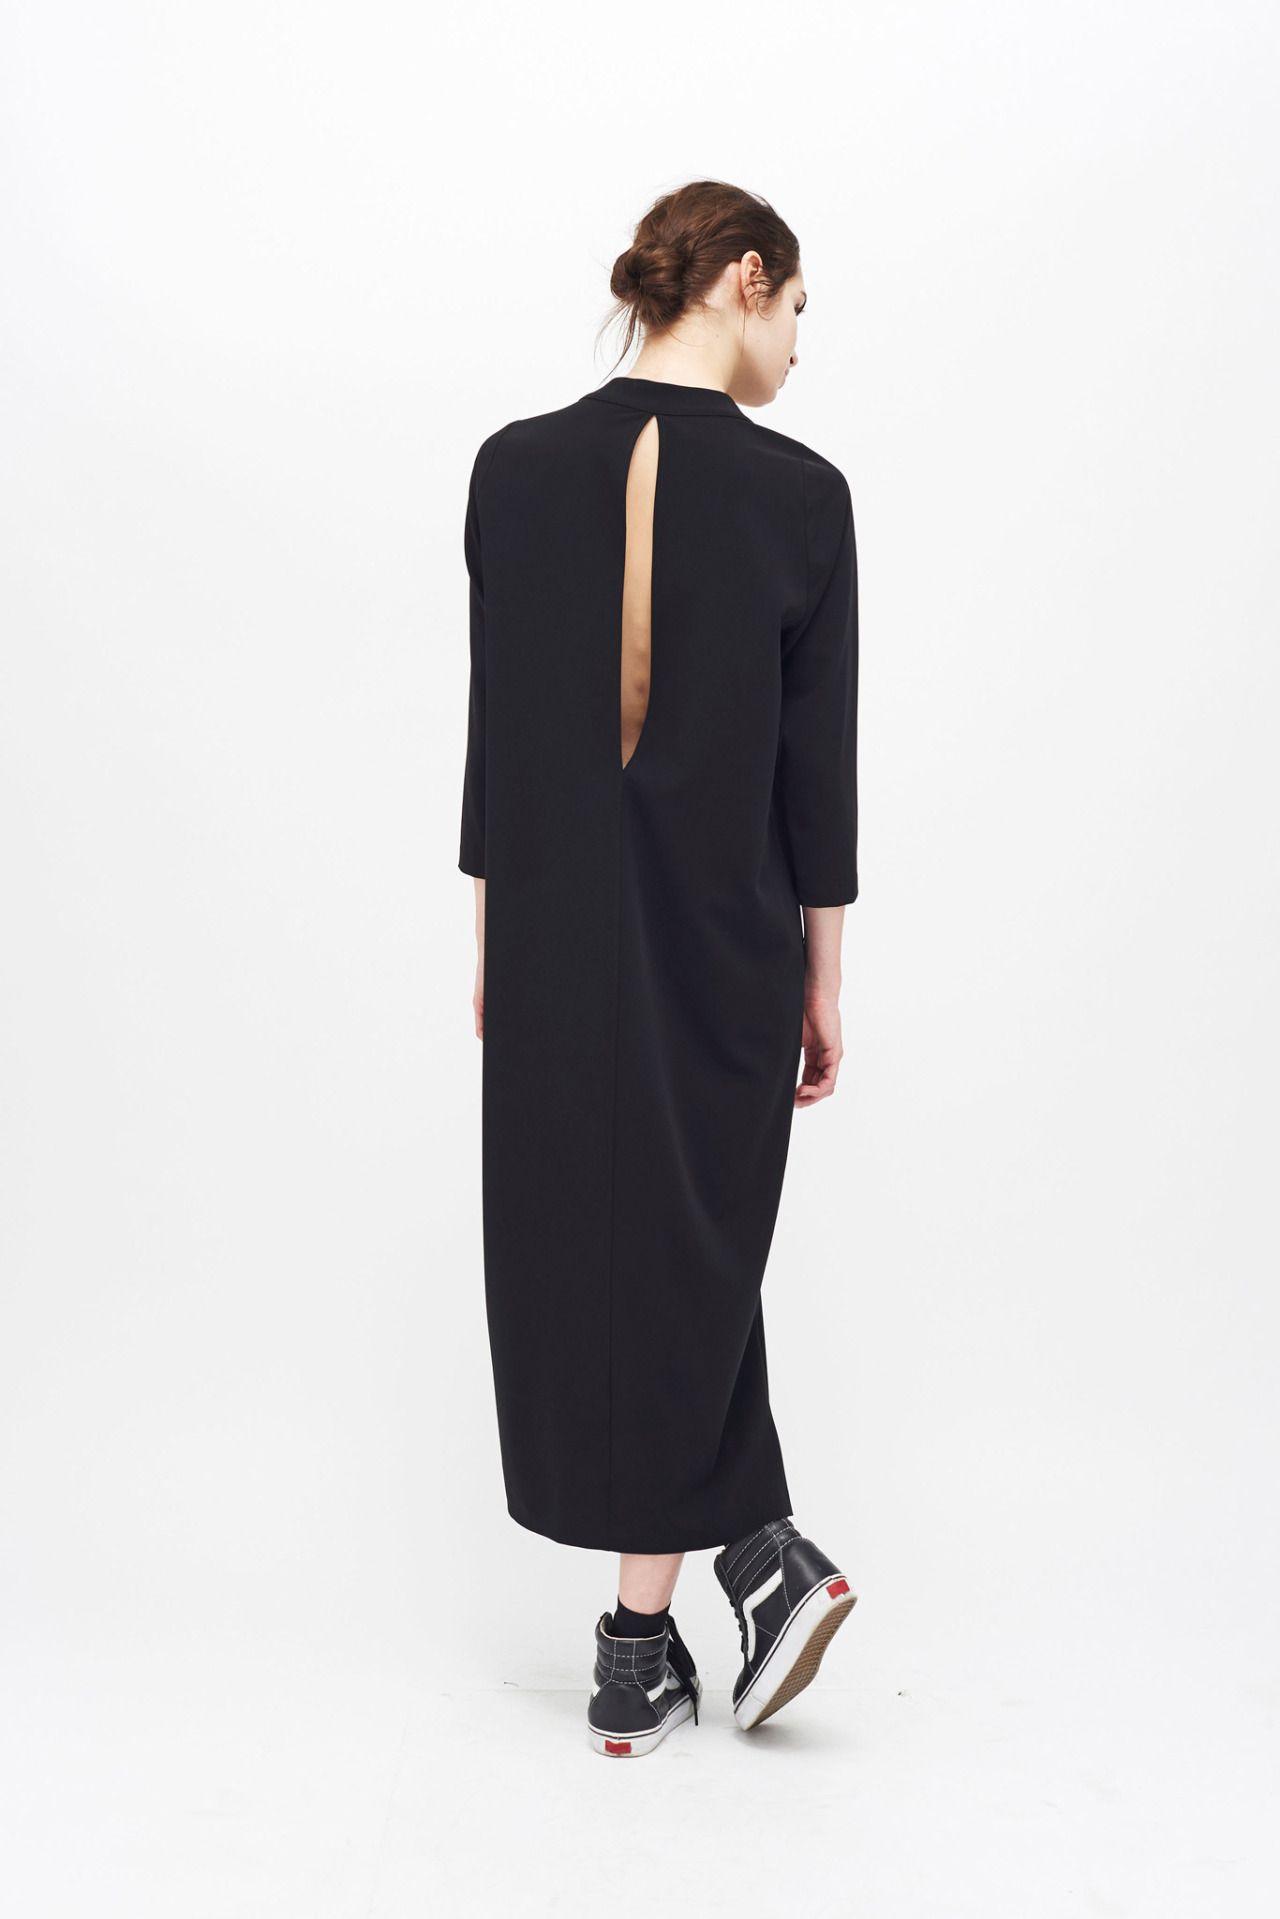 #youcancallmehitch #barneybarrett #minimalism #fashion #style #model #monochromatic #black #vans